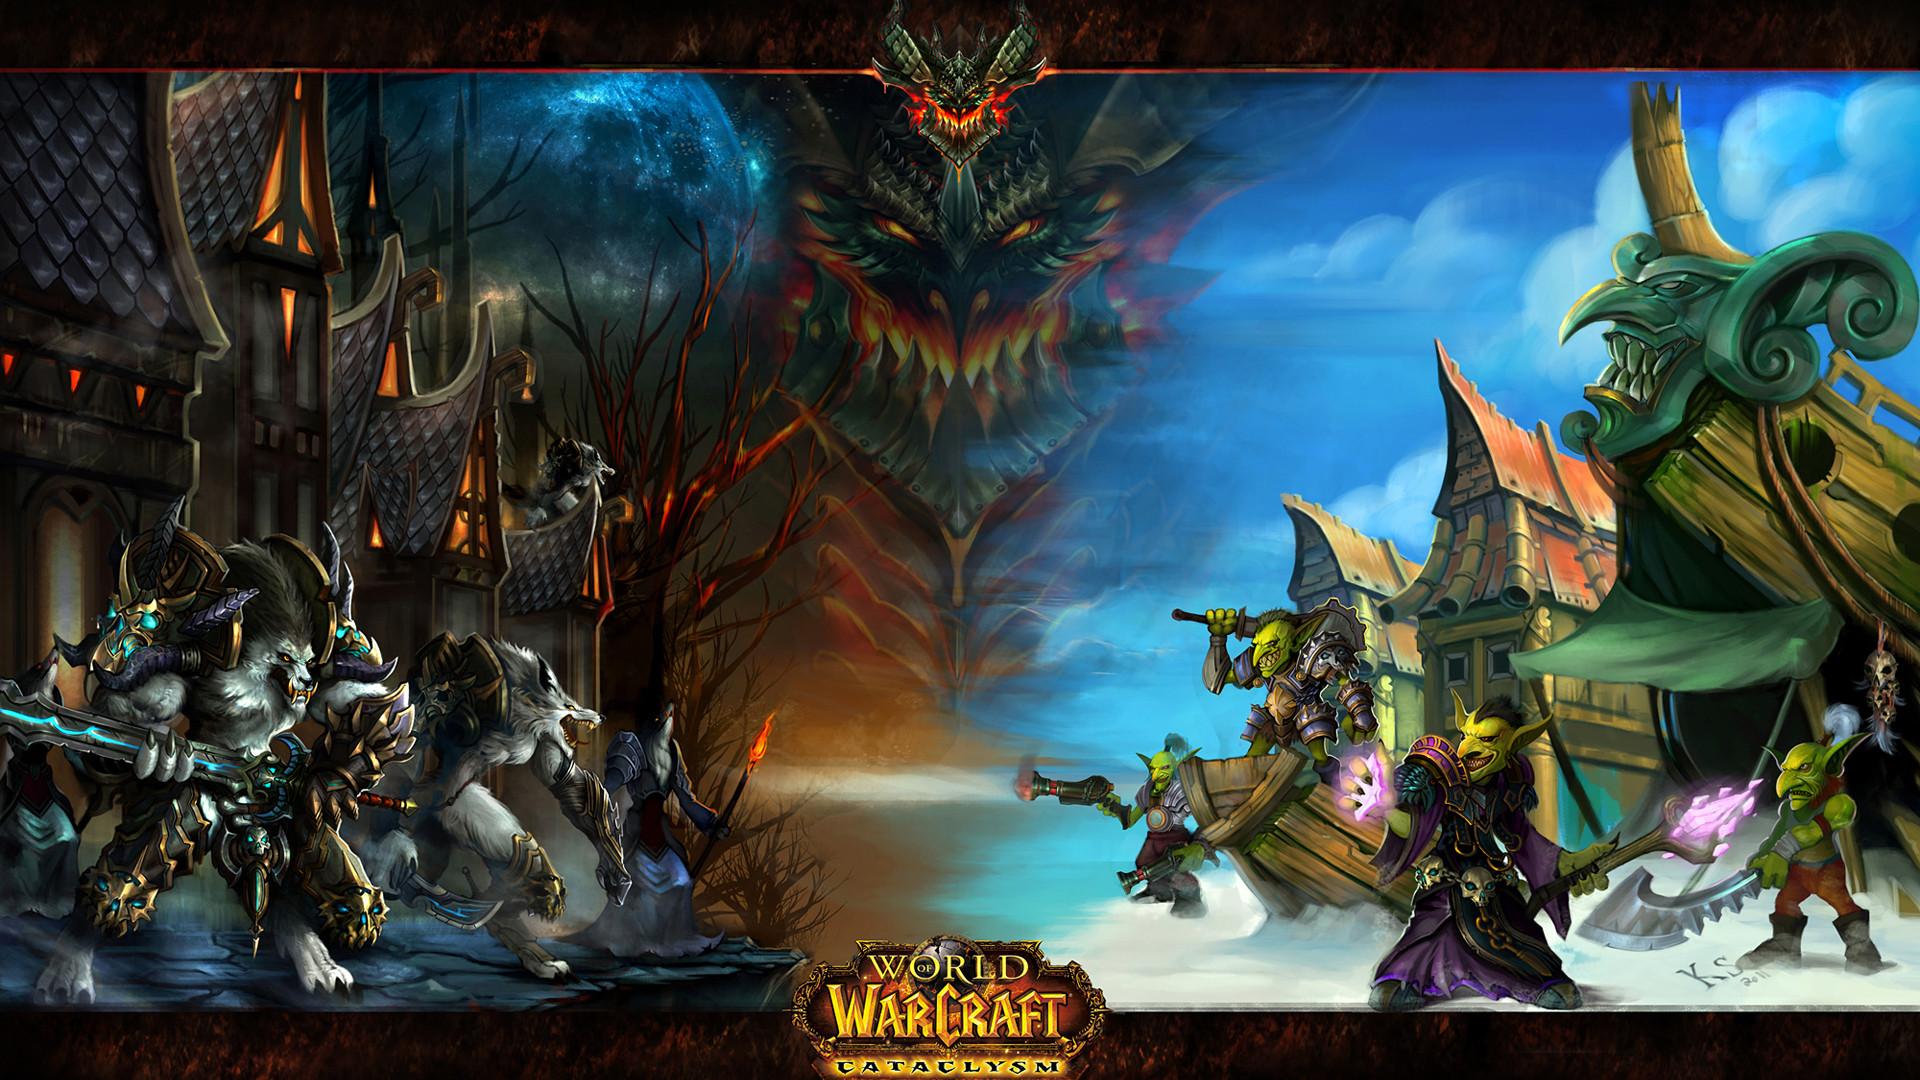 images of world of warcraft goblins | Wallpaper world of warcraft  cataclysm, goblins, Worgen